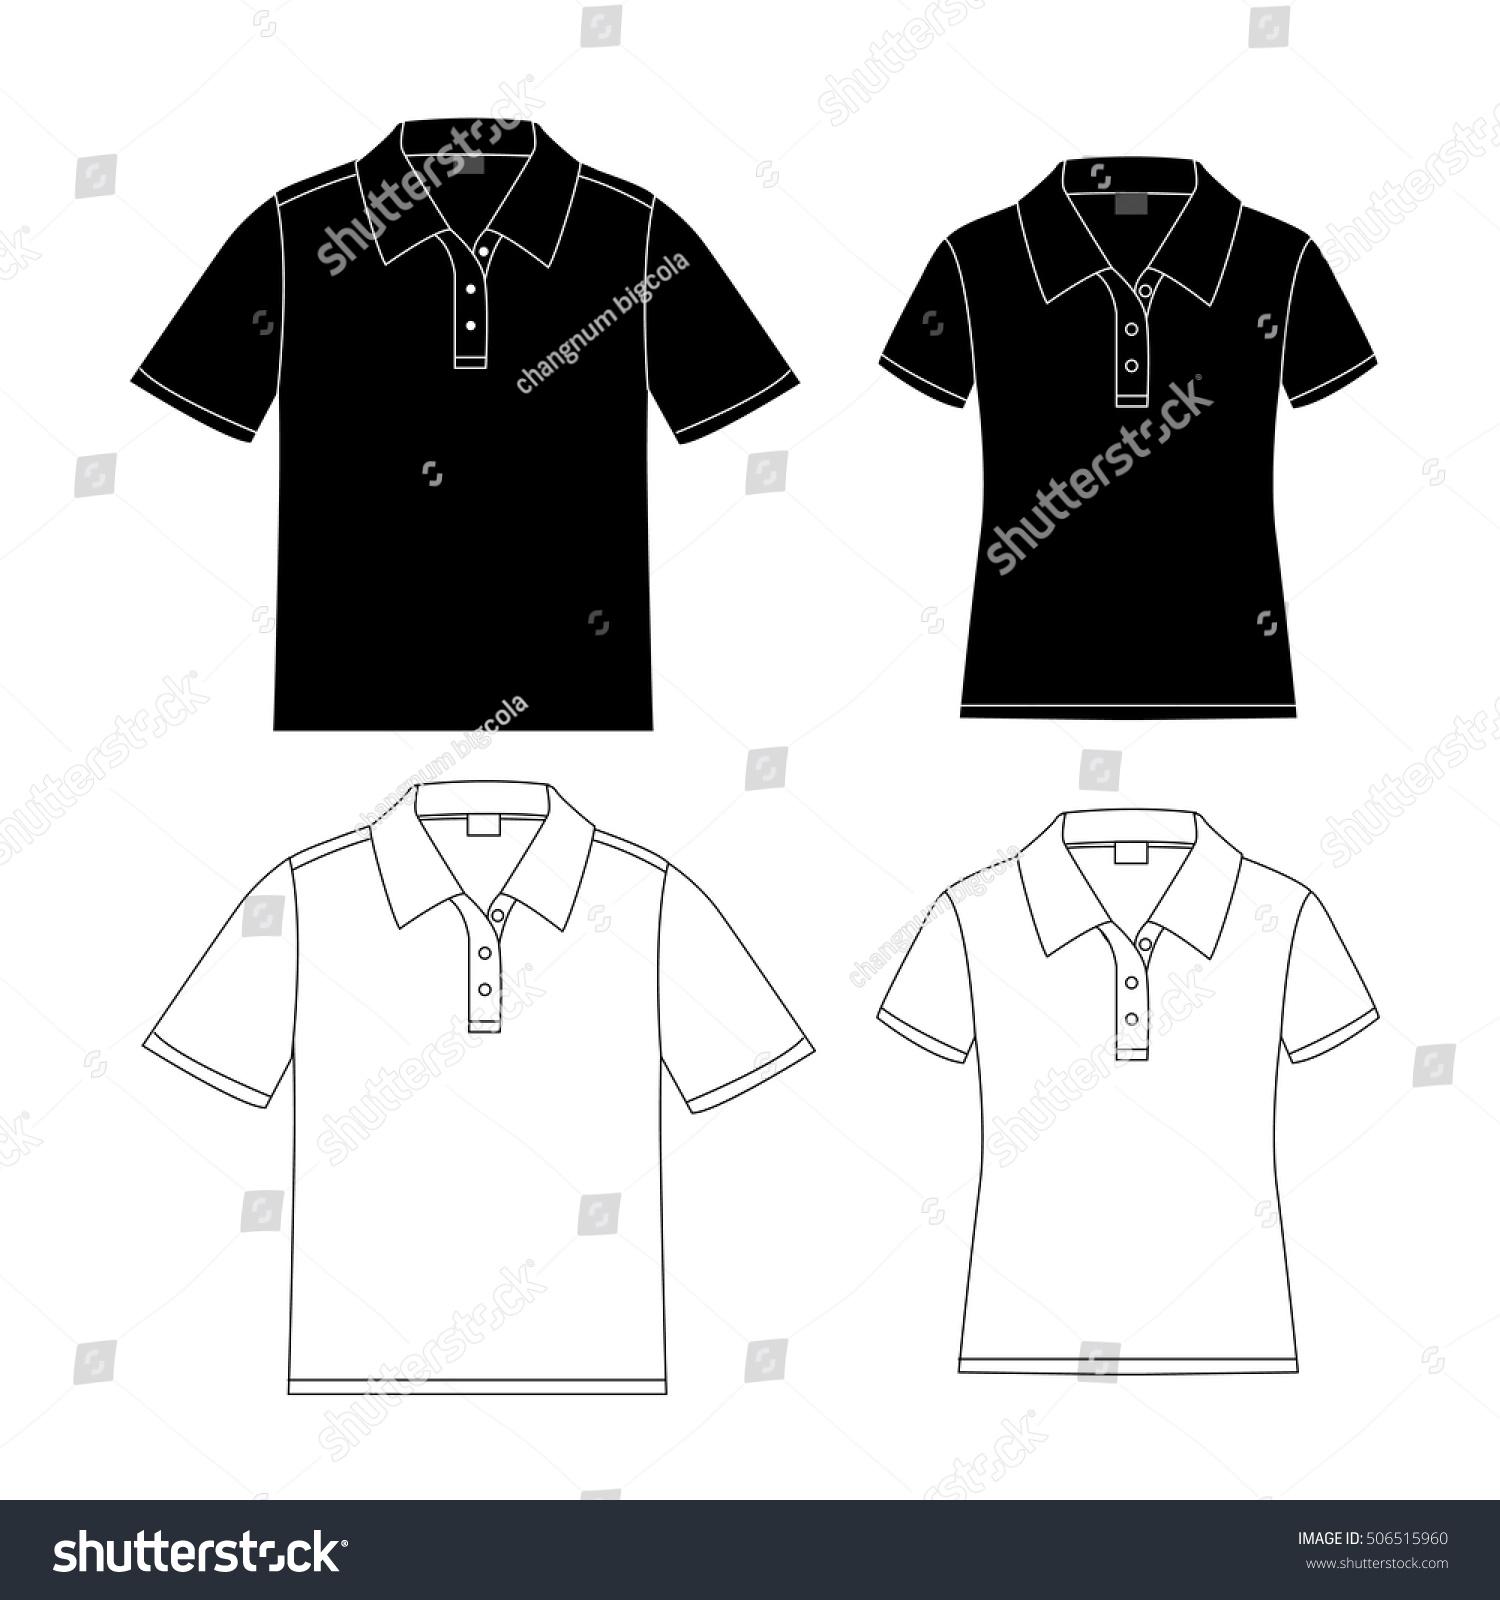 Shirt design vector pack - Set Of Vector Polo Shirt Design